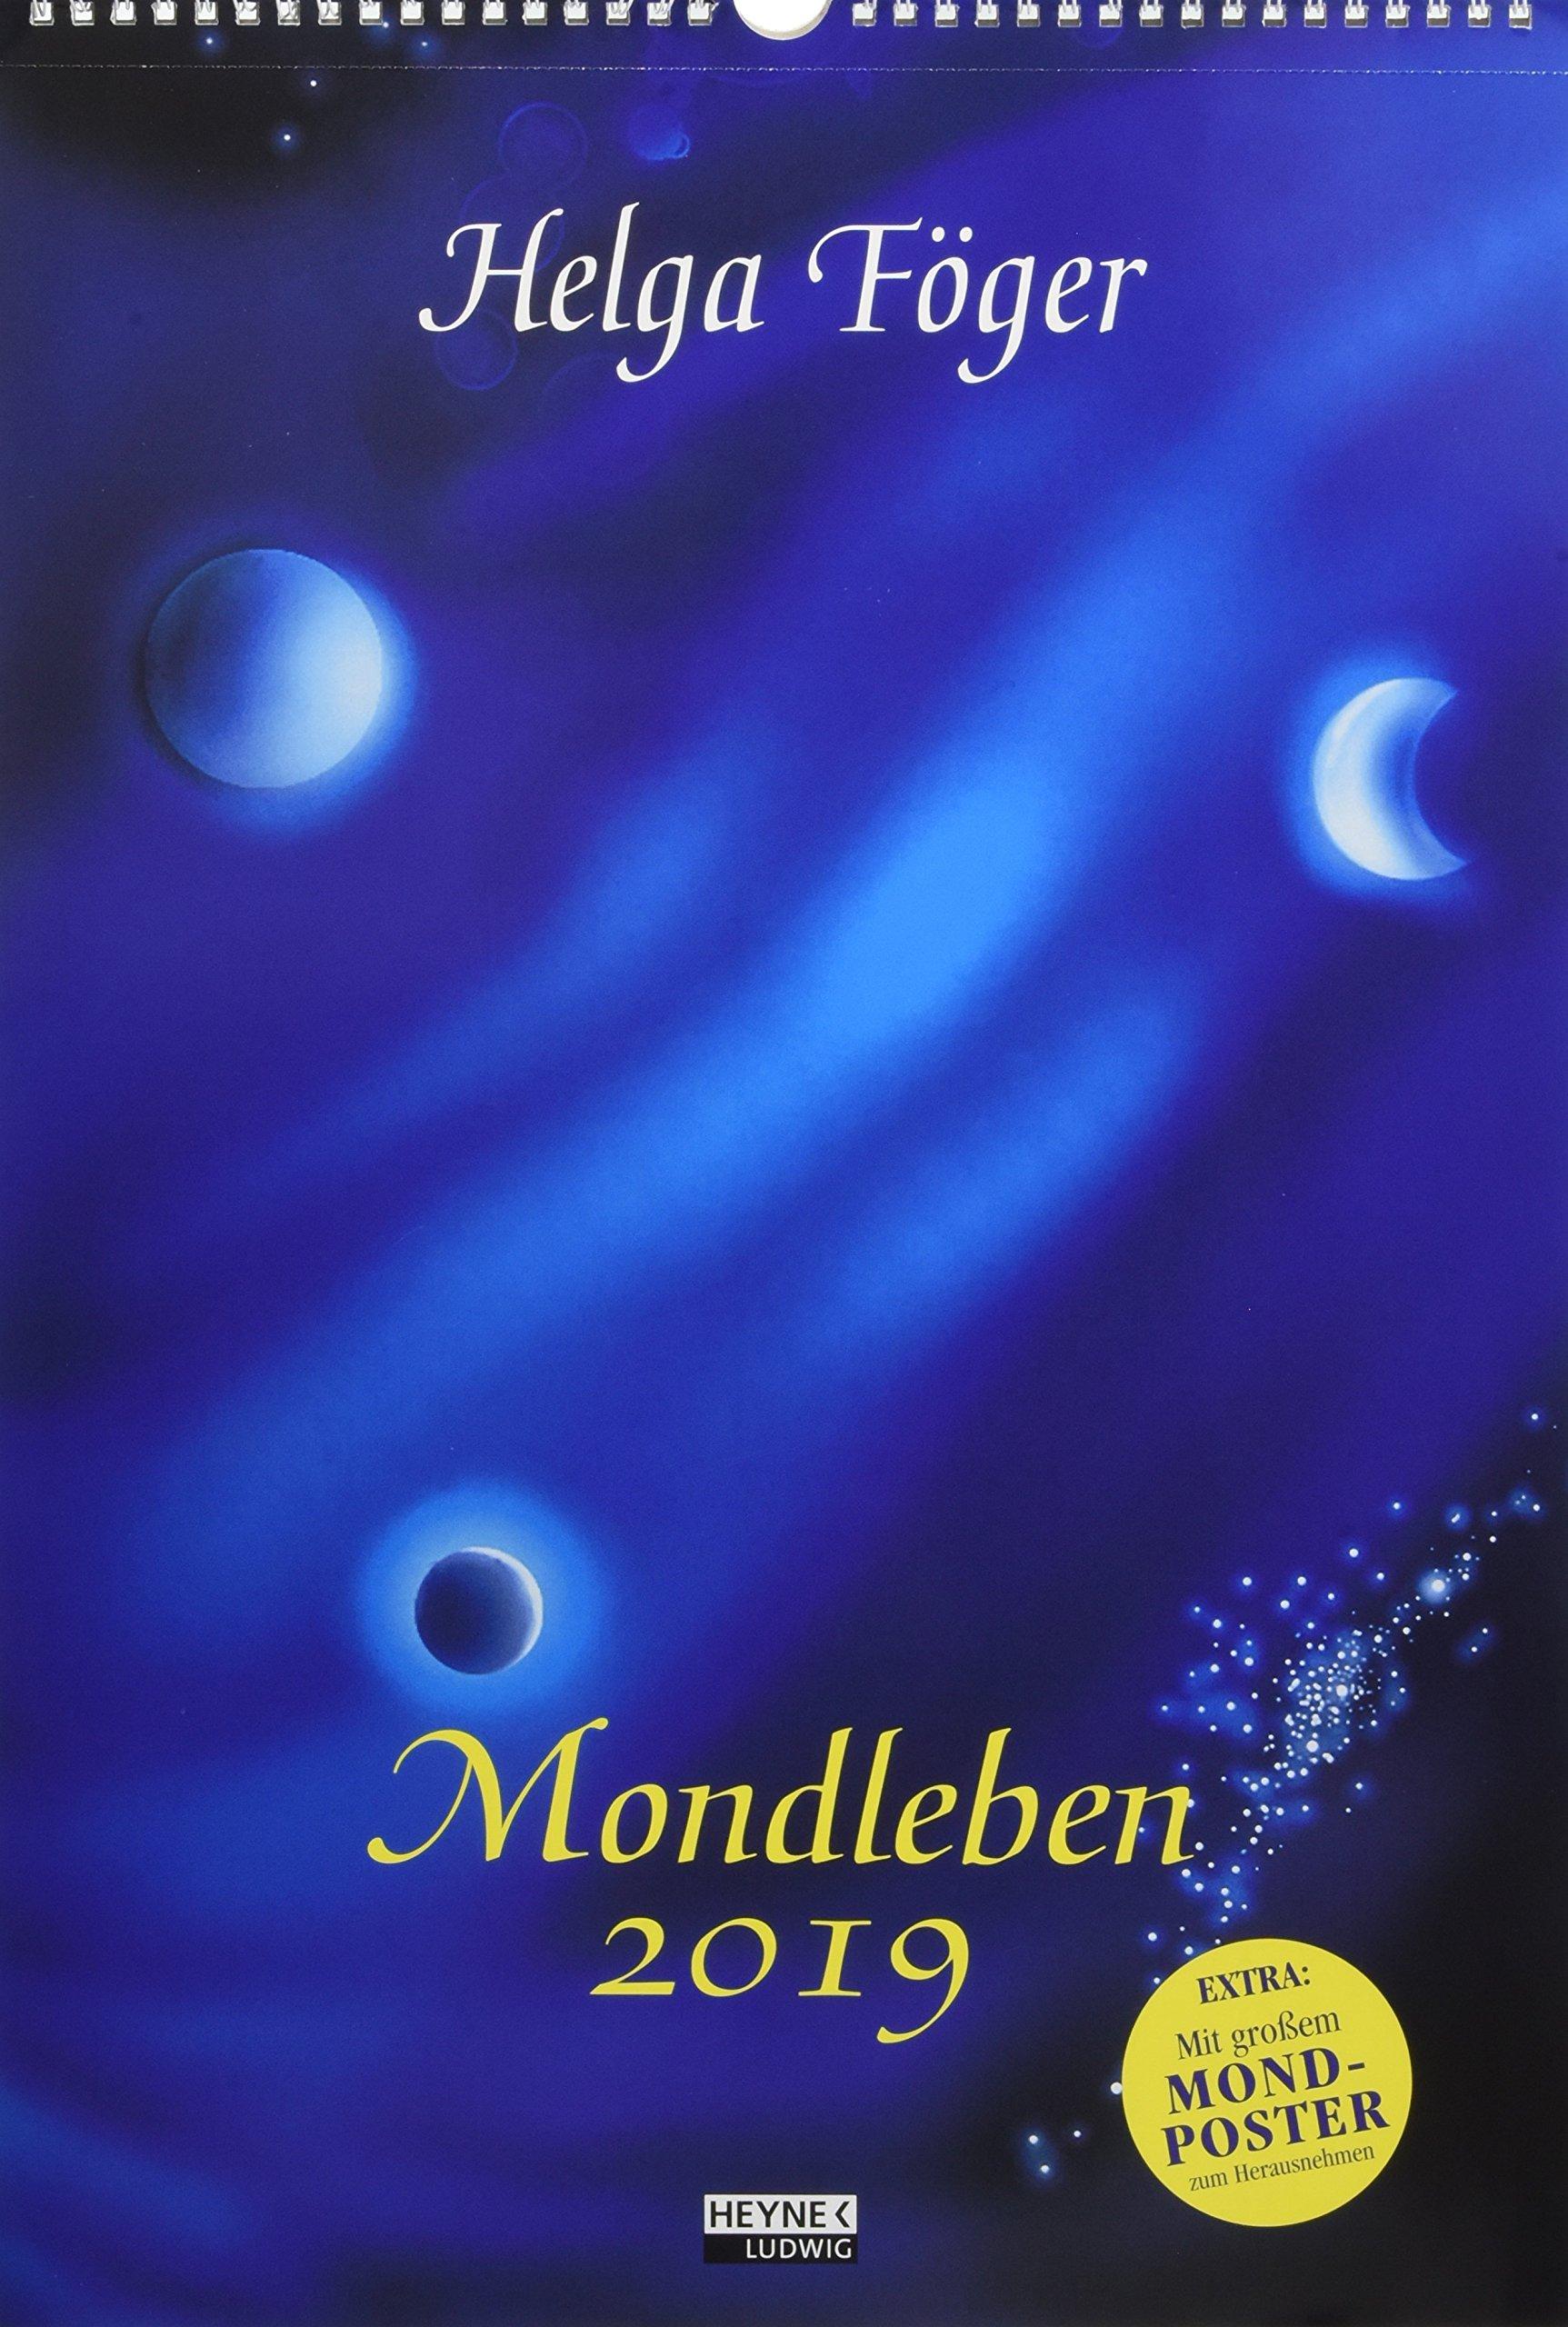 Mondleben 2019: Wandkalender Kalender – 4. Juni 2018 Helga Föger Ludwig bei Heyne 3453237609 Ratgeber / Sonstiges